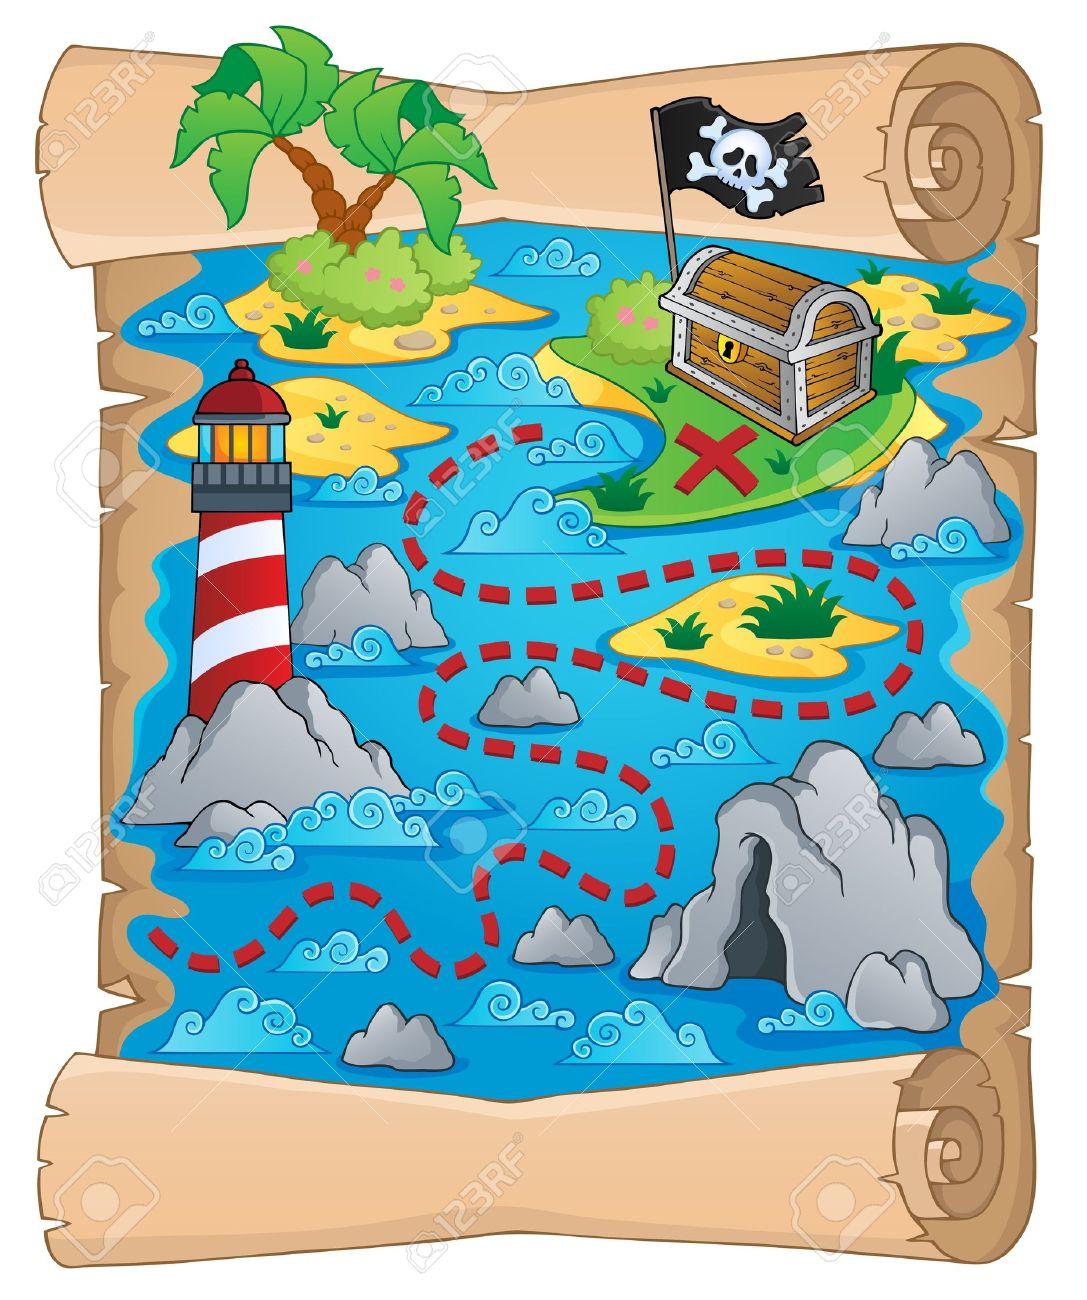 Treasure Map Theme Royalty Free Cliparts, Vectors, And Stock ...